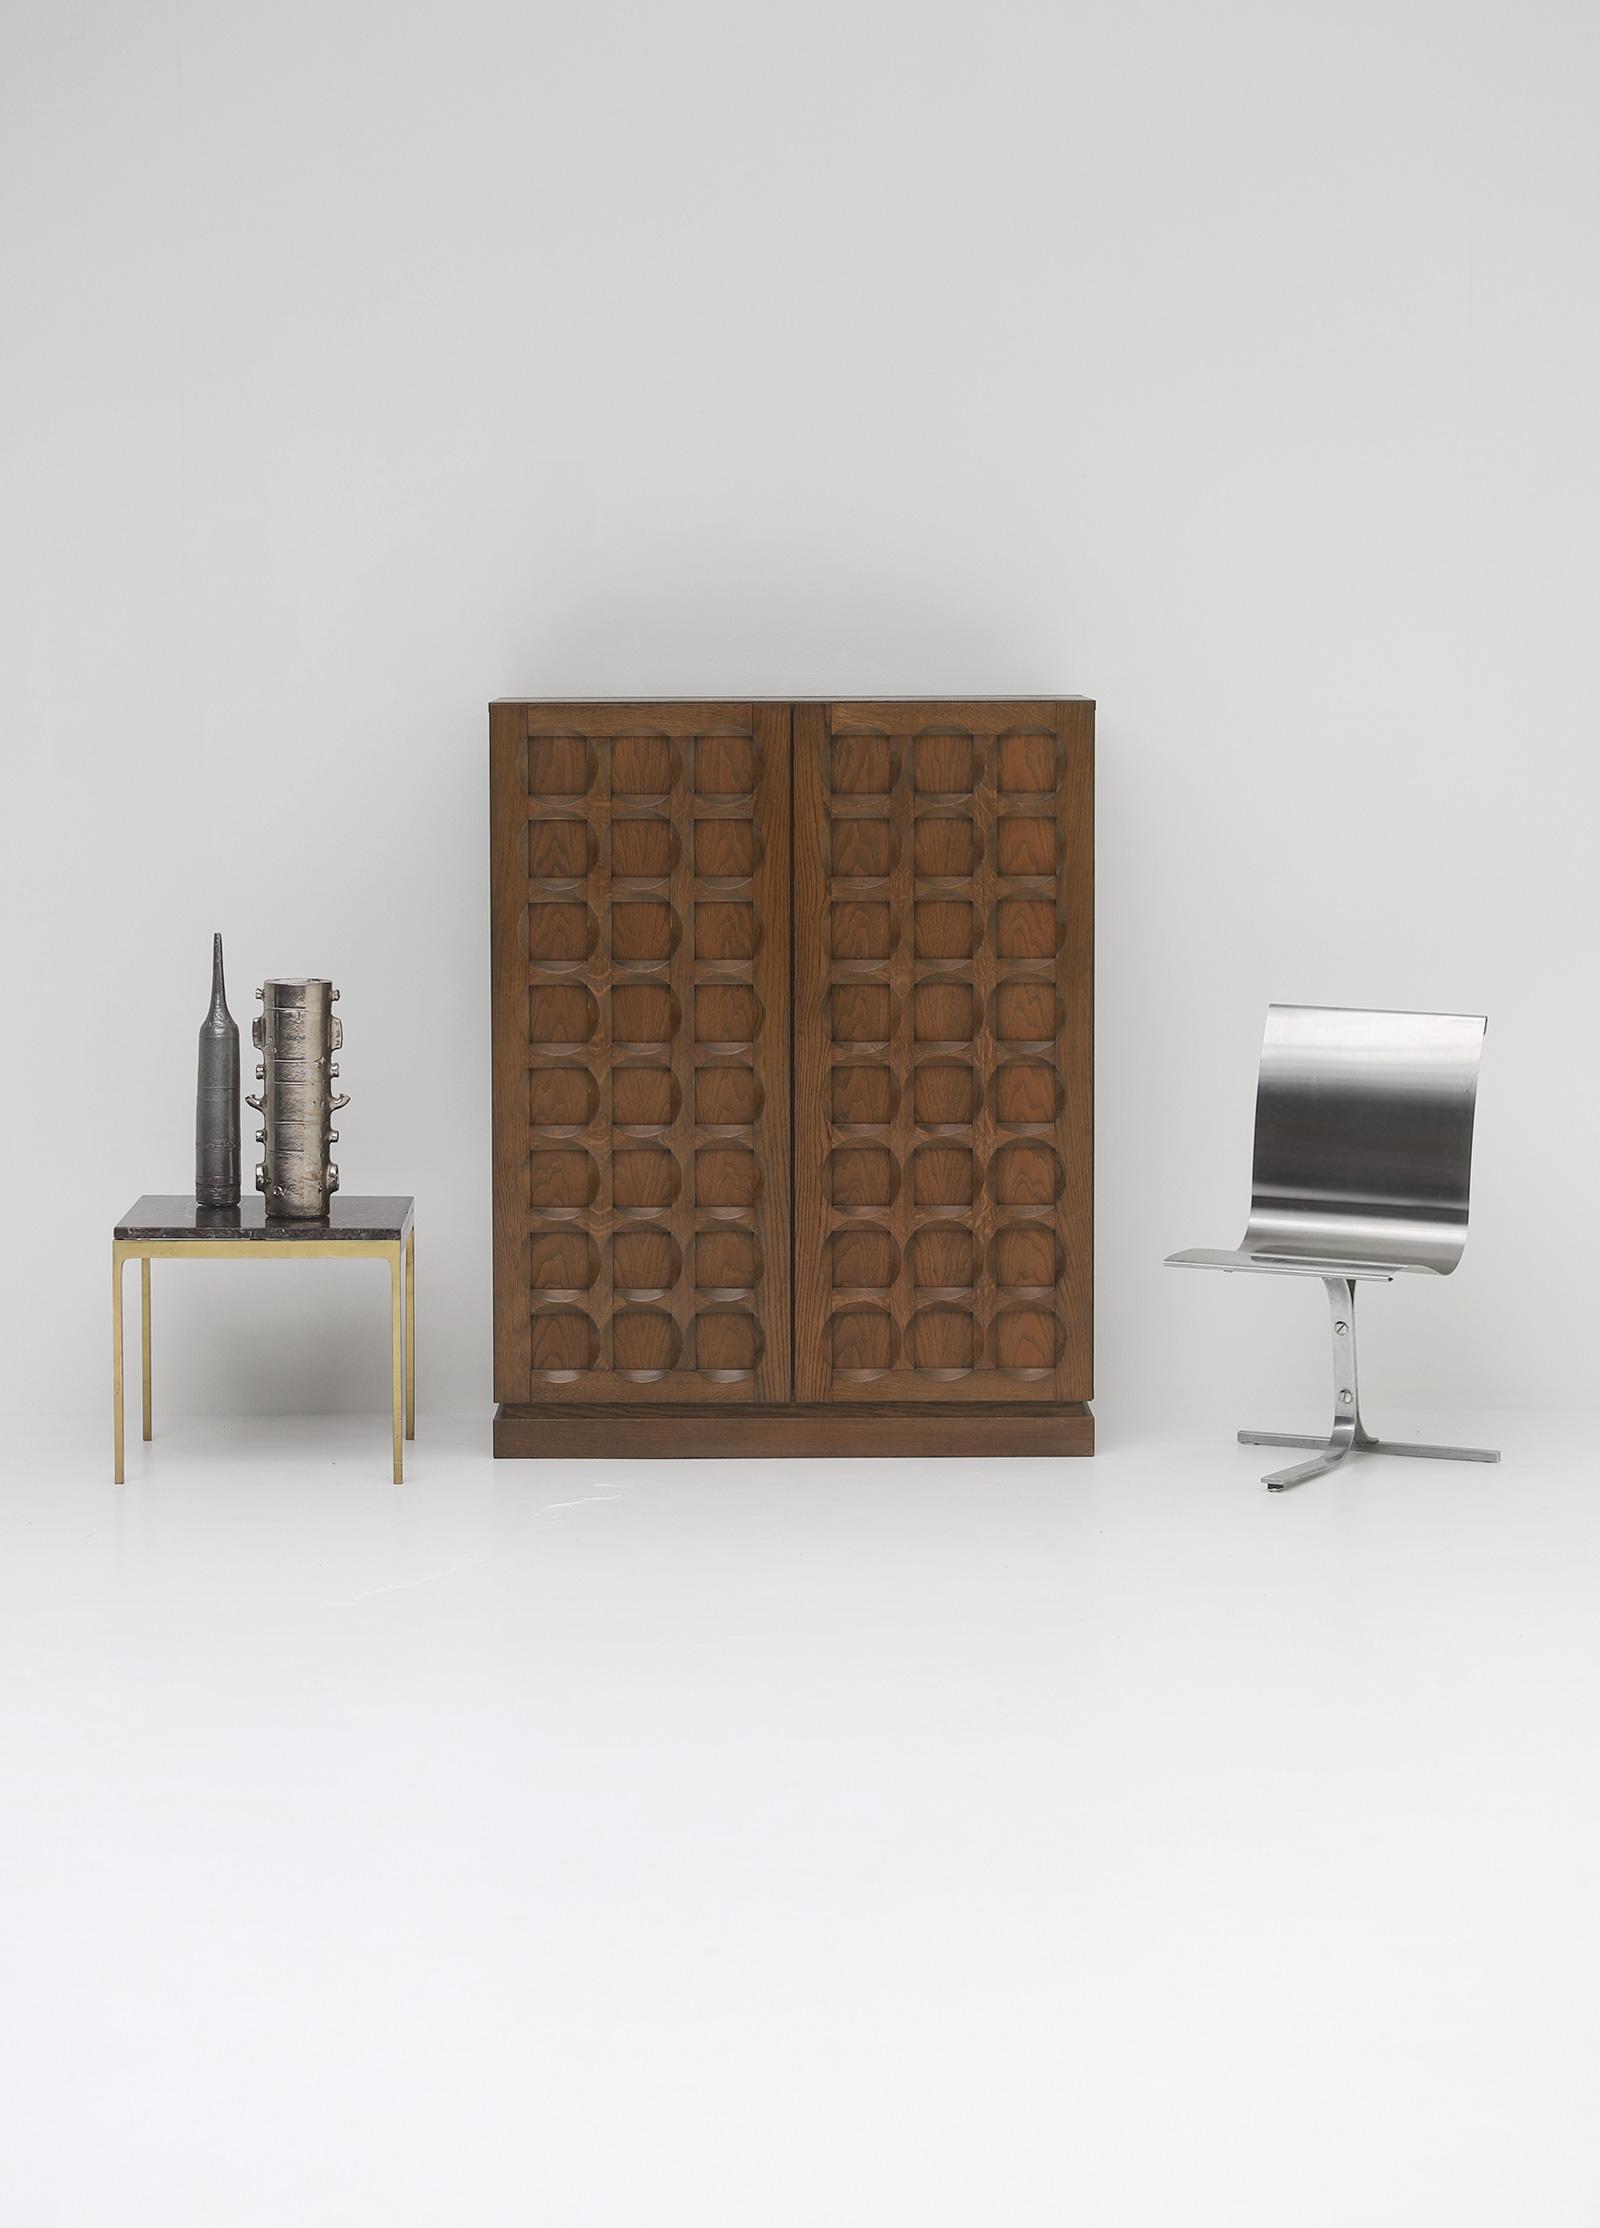 1970s Defour Cabinet Graphical Door Panels image 1